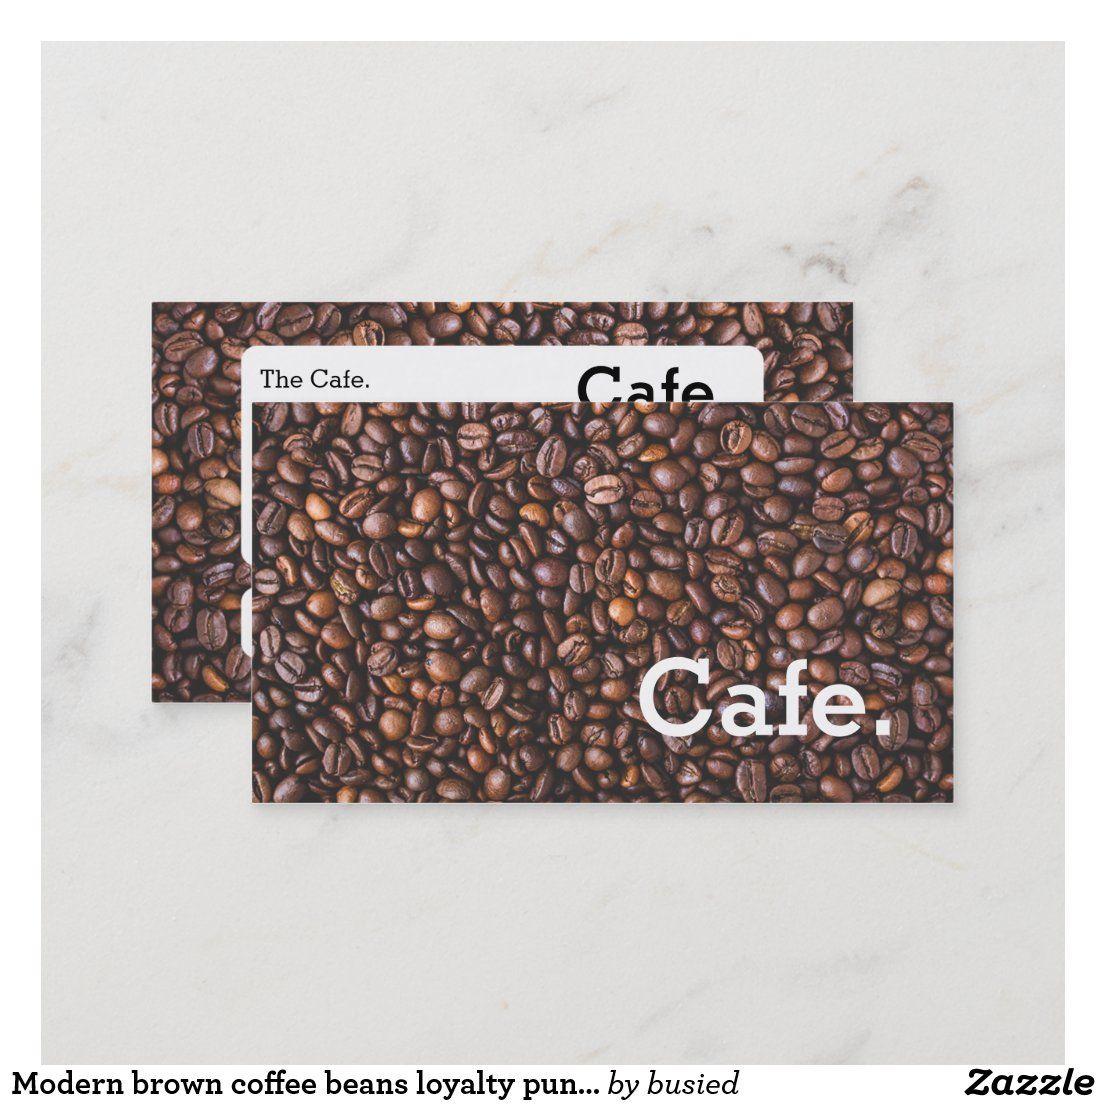 Modern Brown Coffee Beans Loyalty Punch Card Cafe Zazzle Com In 2020 Punch Cards Coffee Beans Loyalty Card Coffee